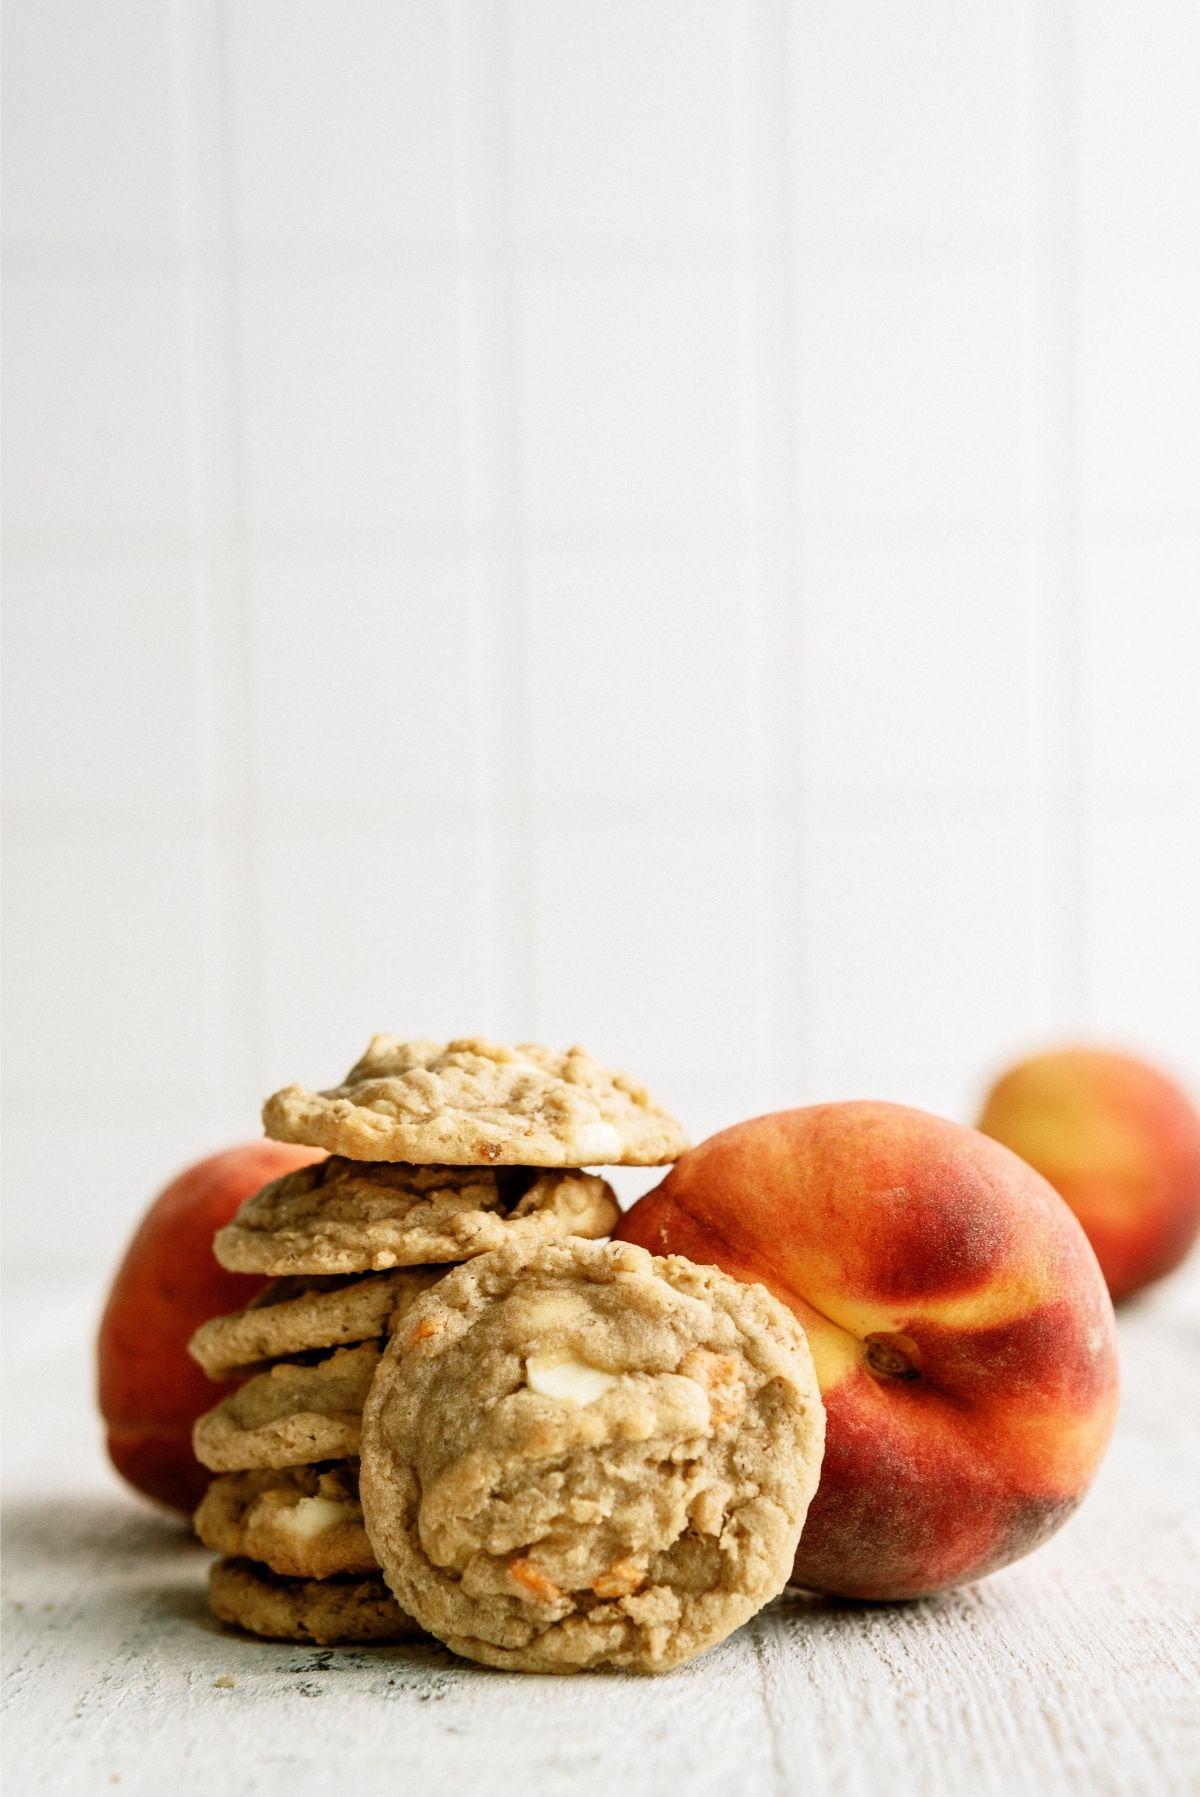 Peaches and Cream Oatmeal Cookies with fresh peaches